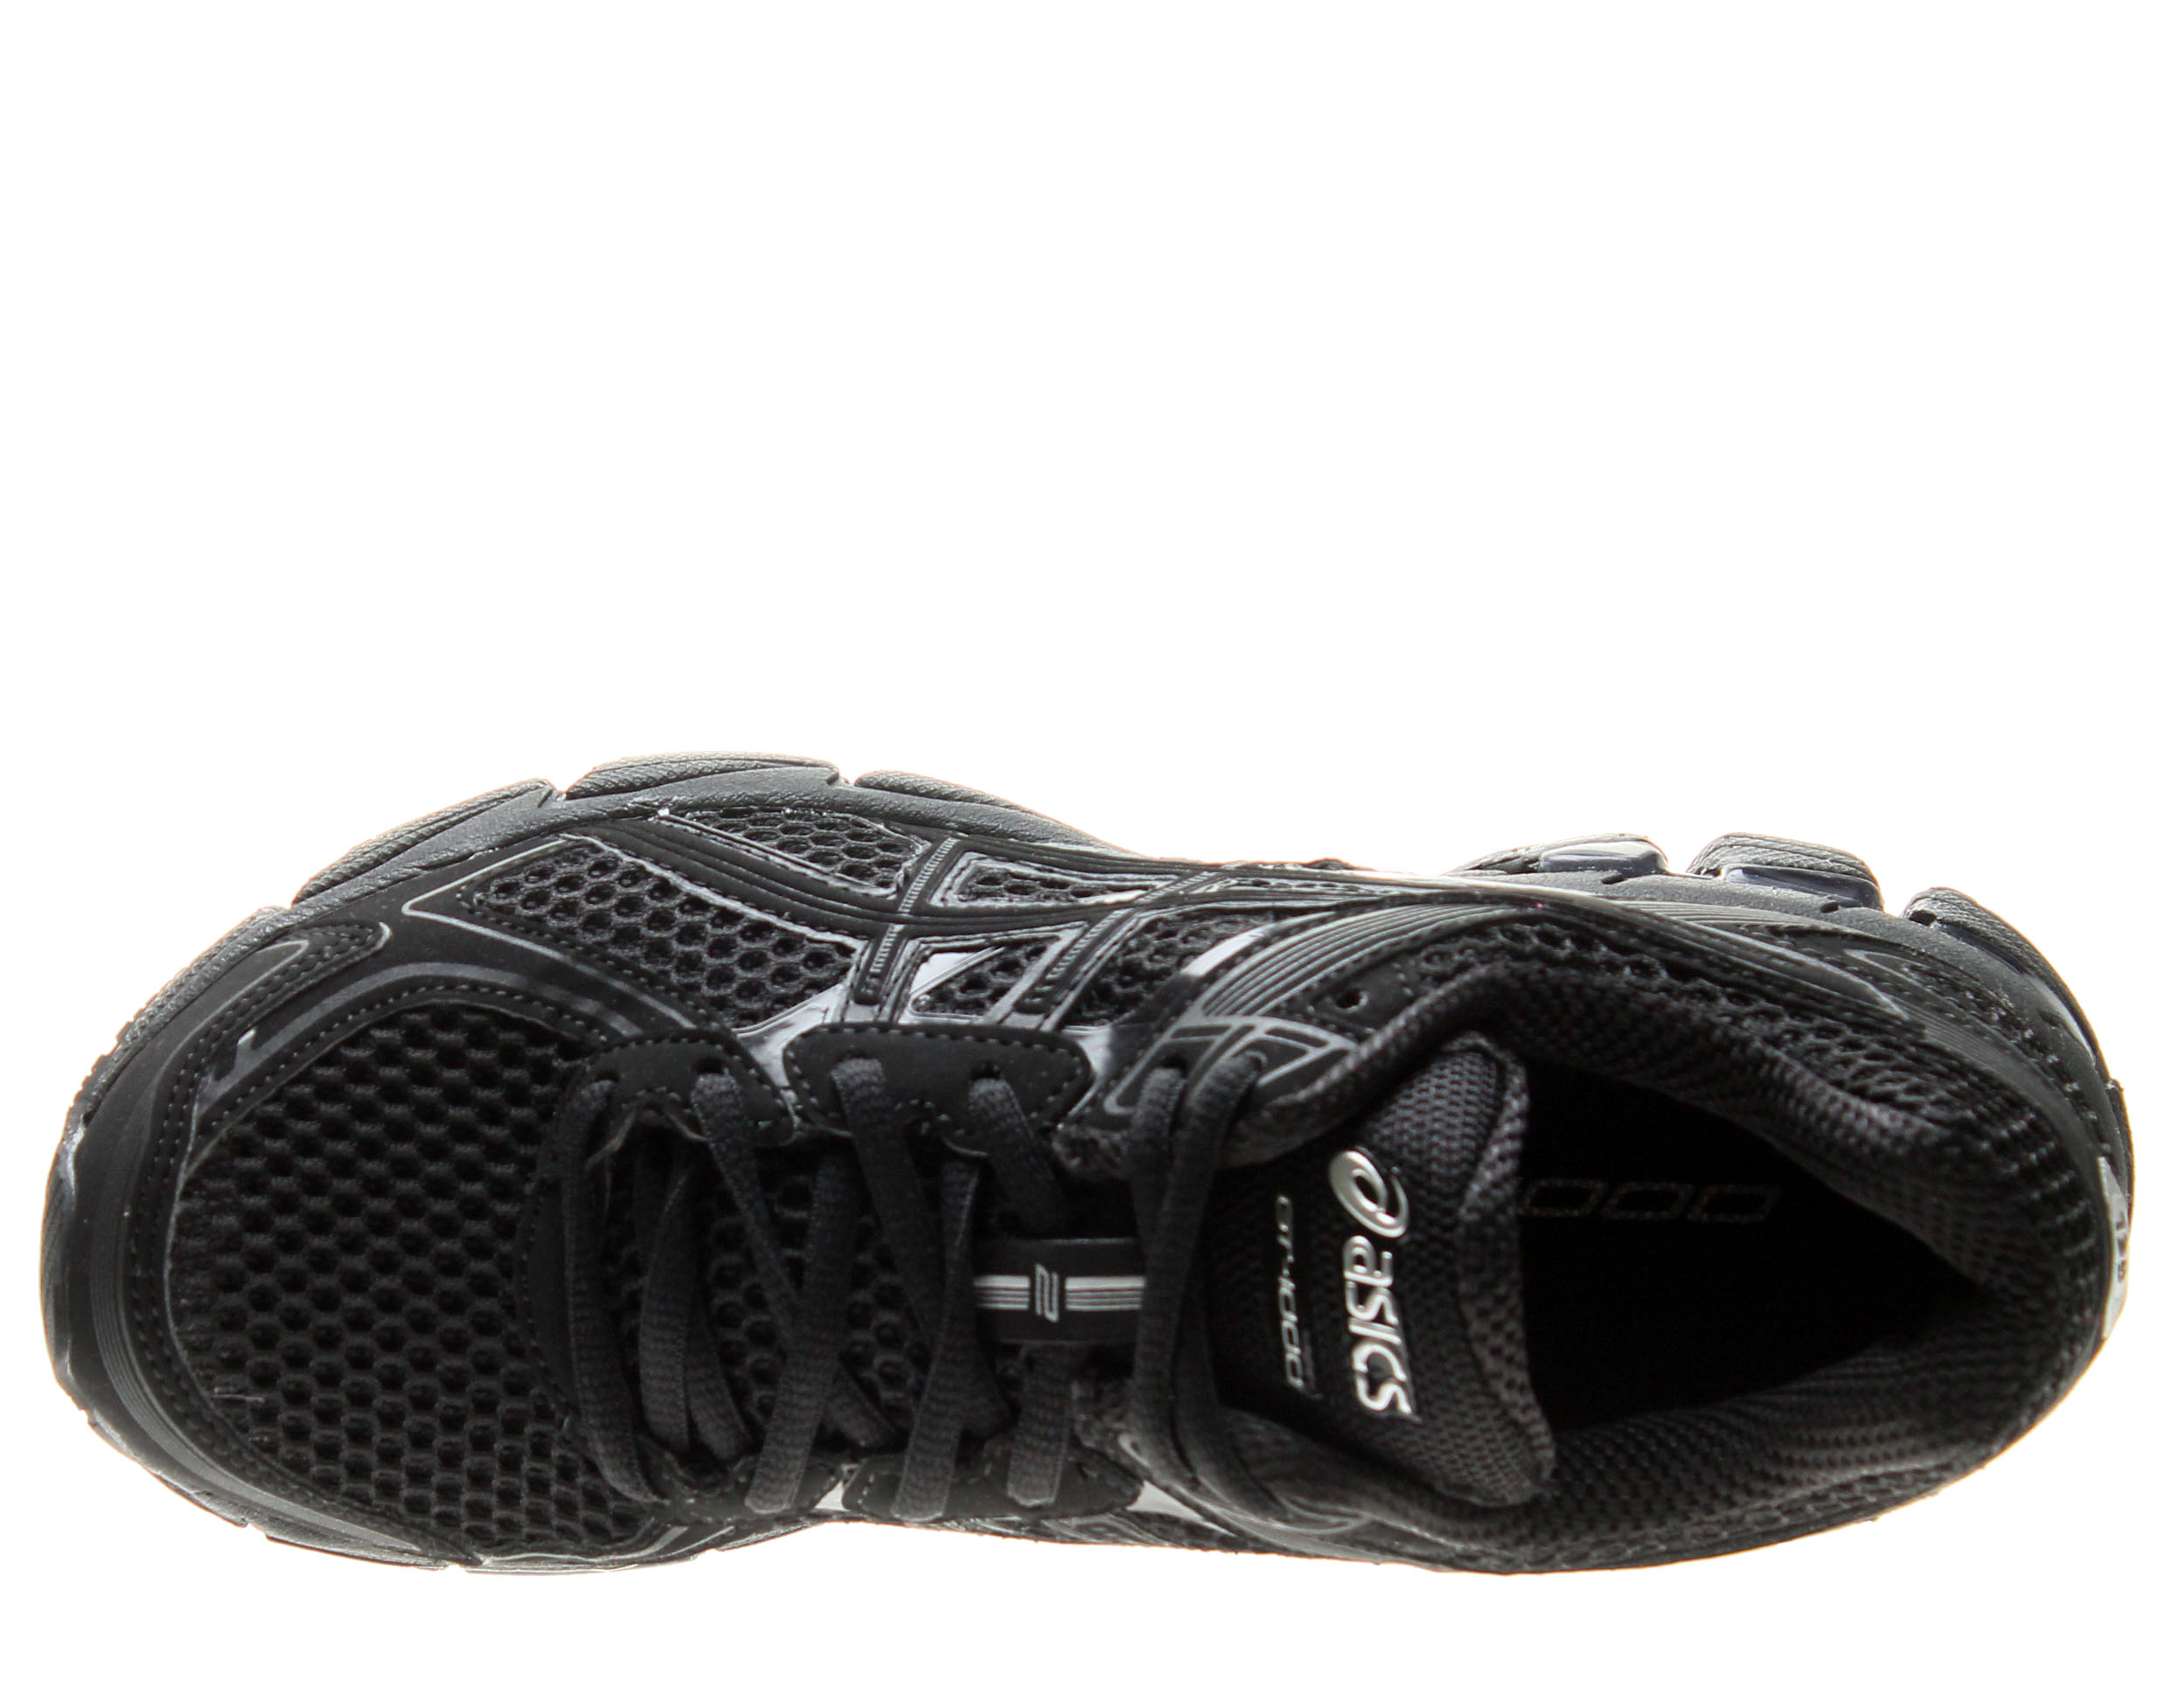 Asics GT-1000 2 Black/Onyx/Lightning Women's Running Shoes T3R6N-9099 Wide